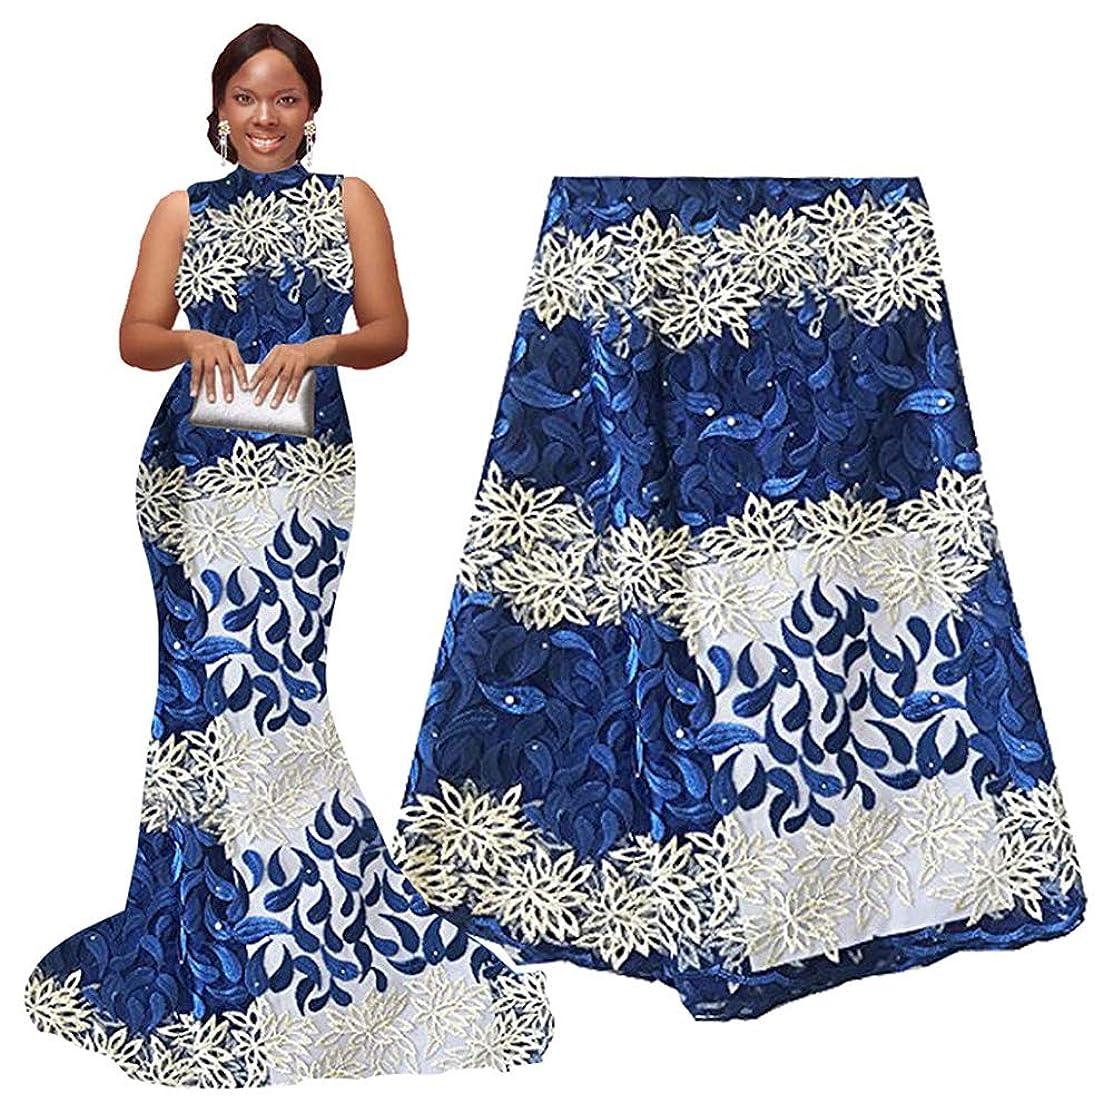 pqdaysun African Lace Fabric 5 Yards 2019 Nigerian Wedding Lace Wax Fabric Rhinestones Beading French Lace F50624 (Royal Blue)